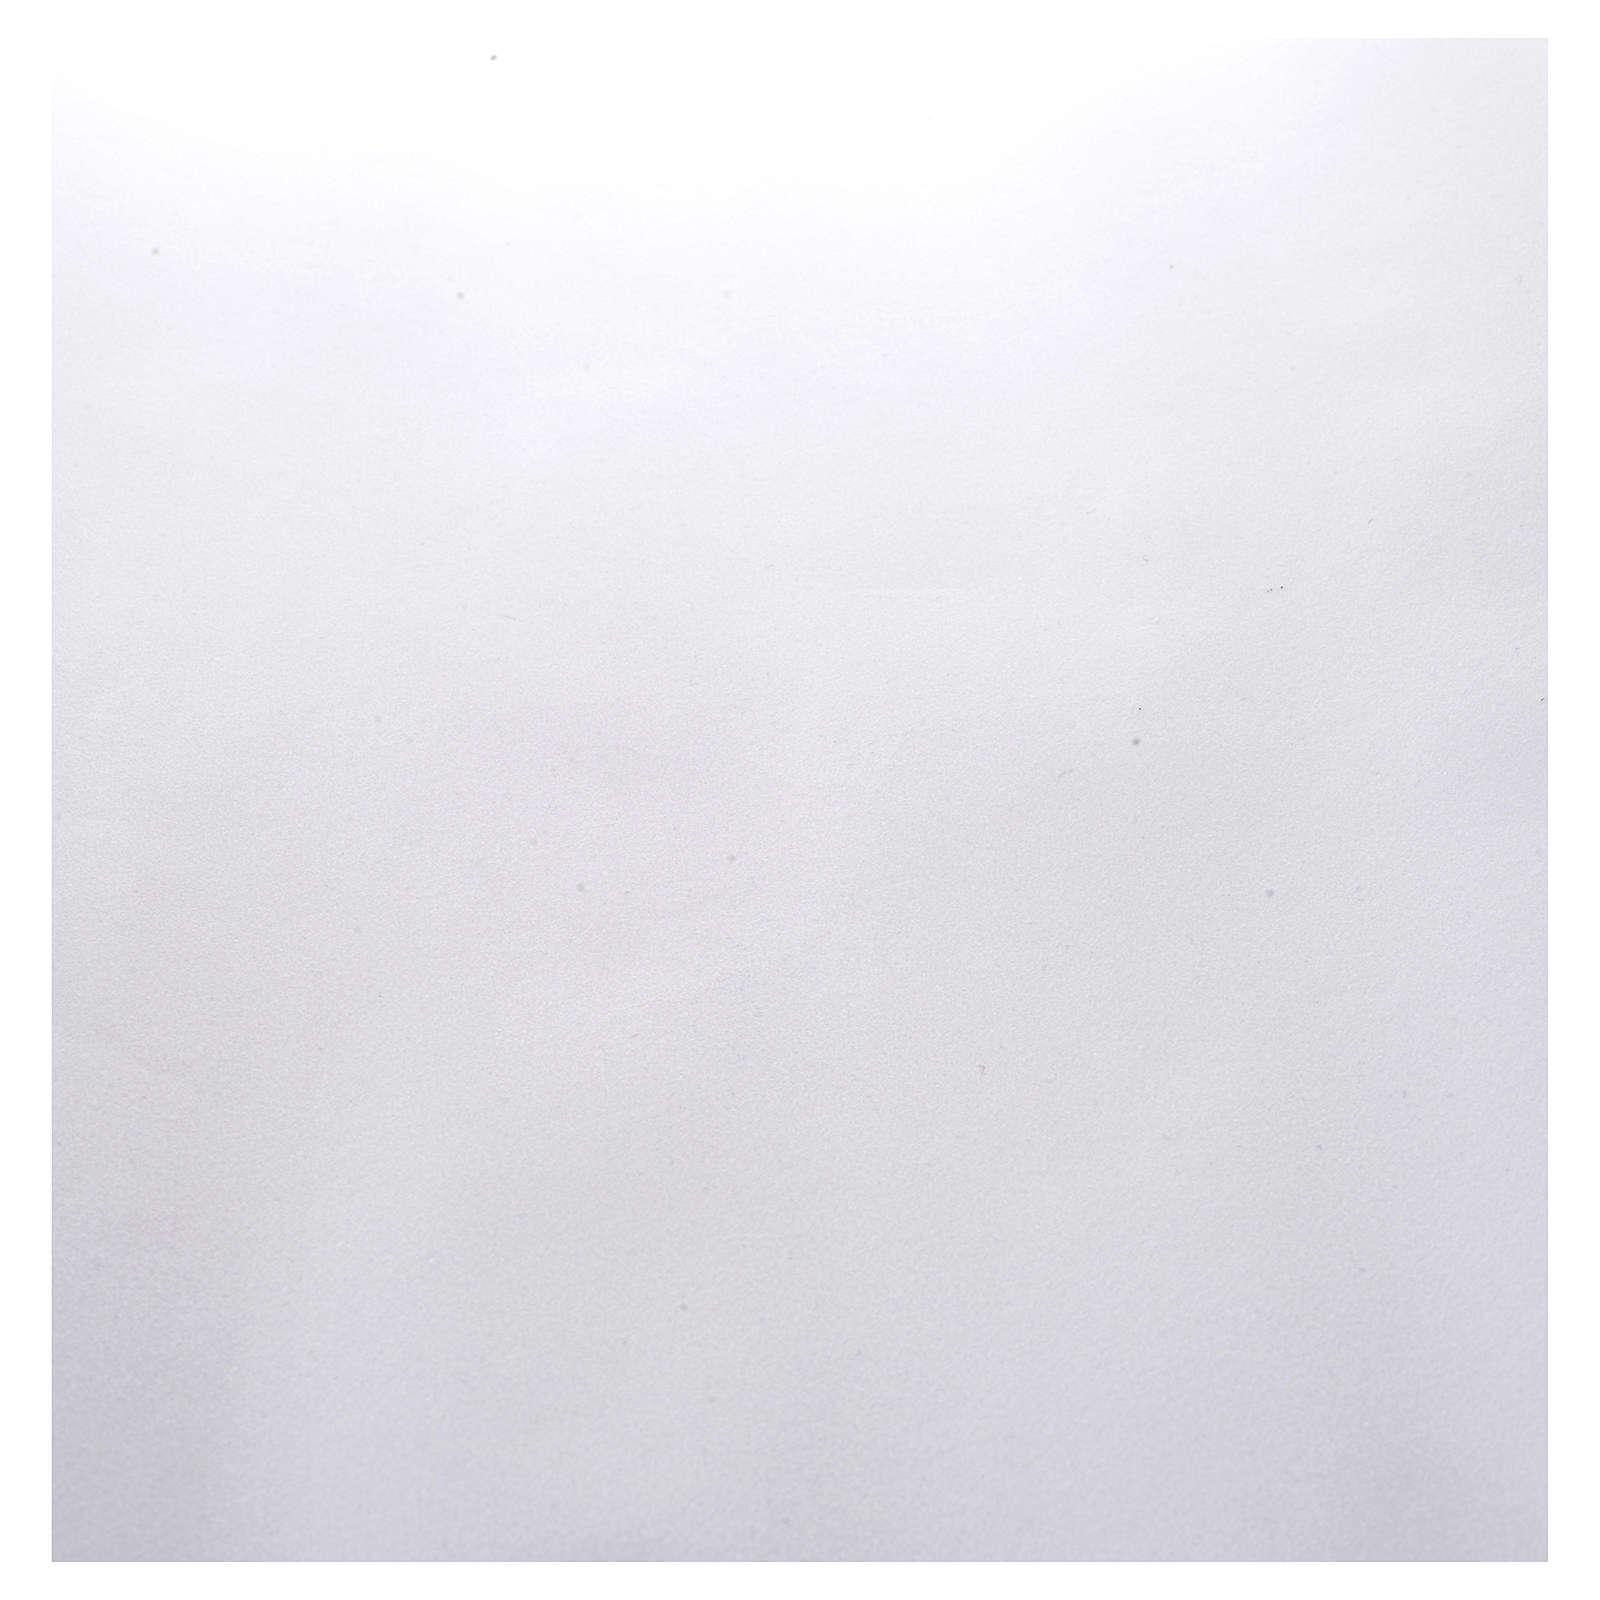 Rotolo carta bianca velluto 70 x 50 cm 4